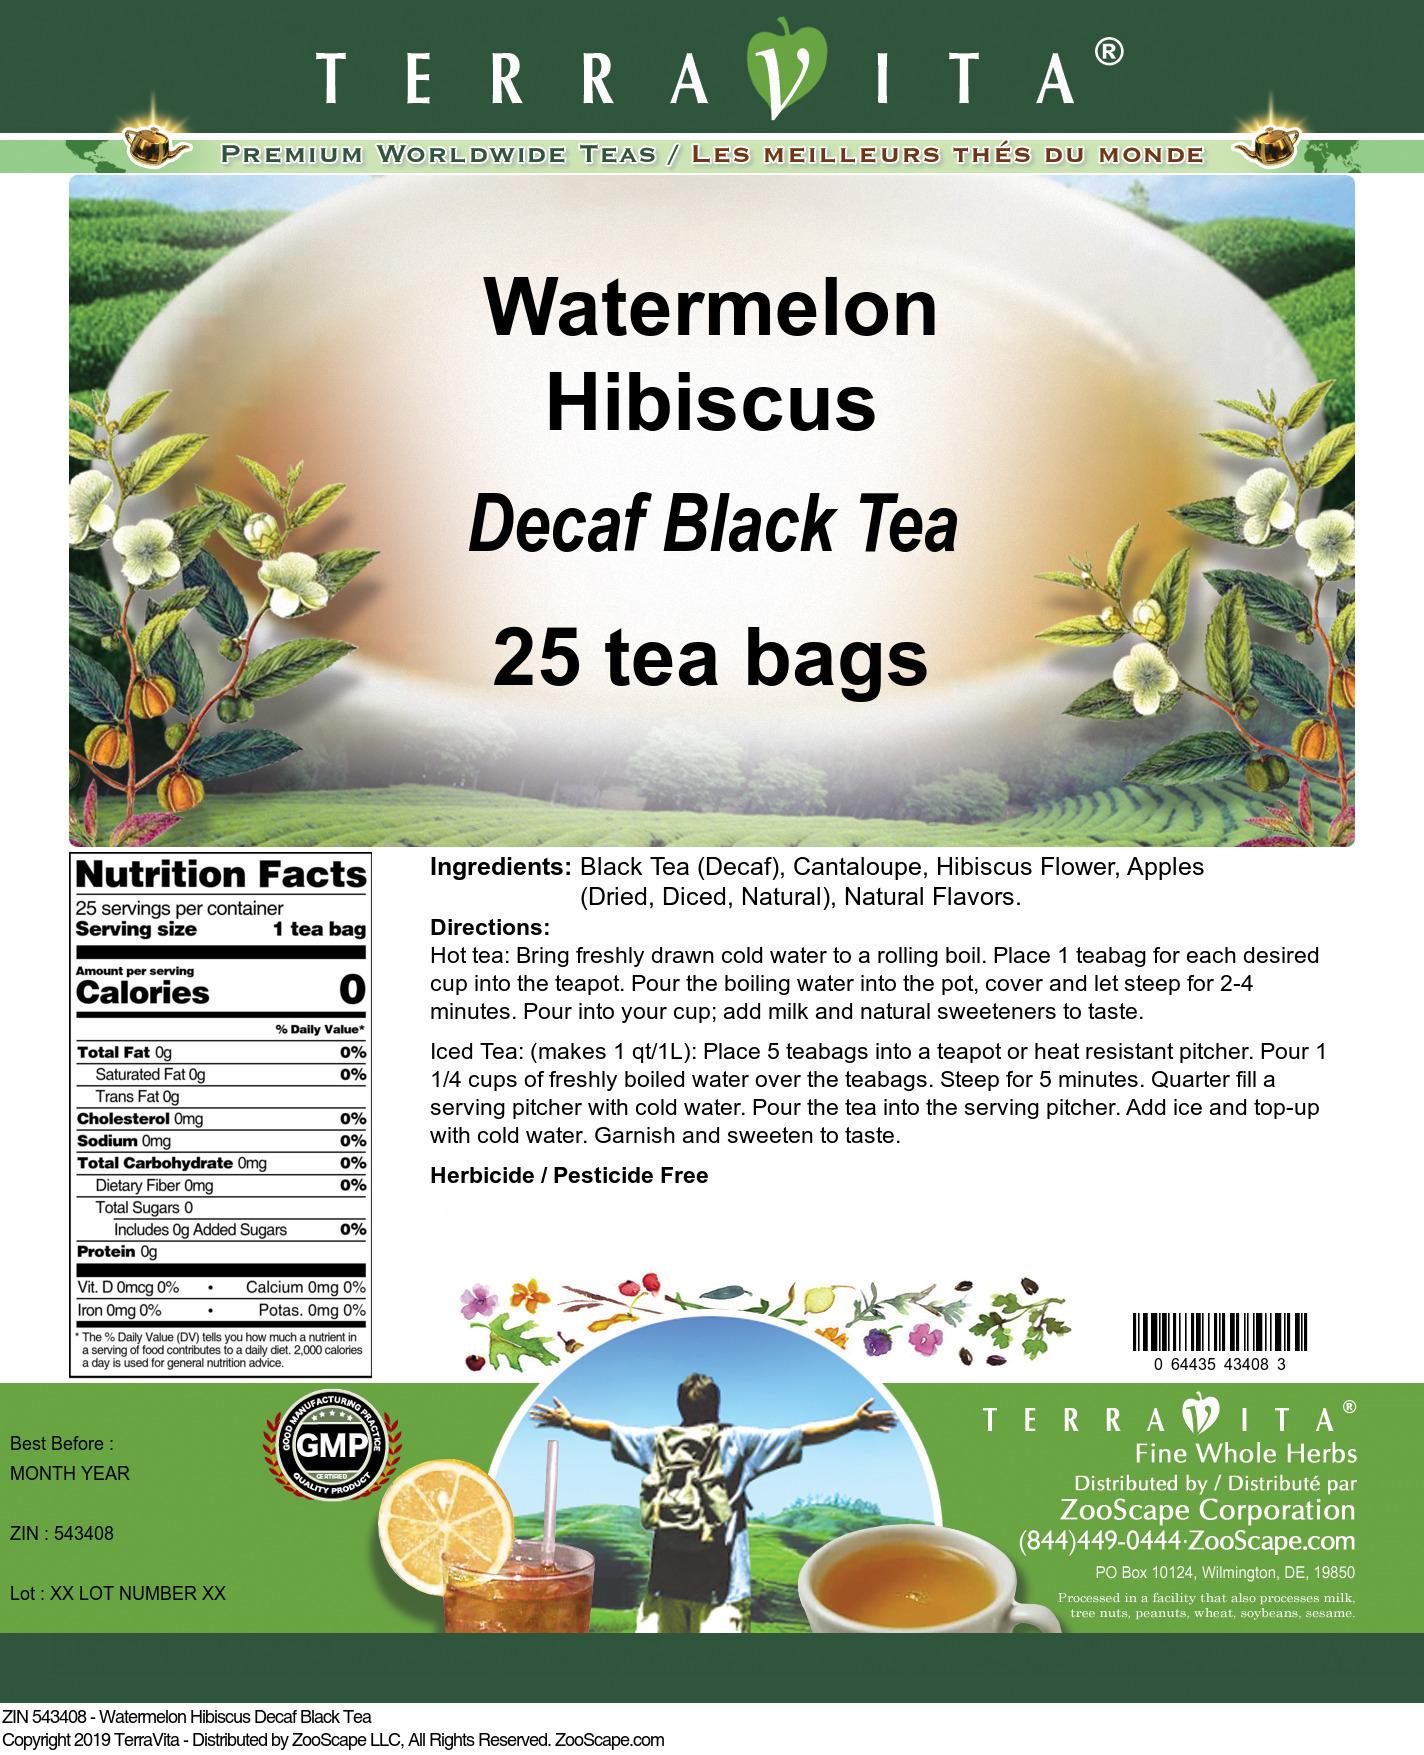 Watermelon Hibiscus Decaf Black Tea